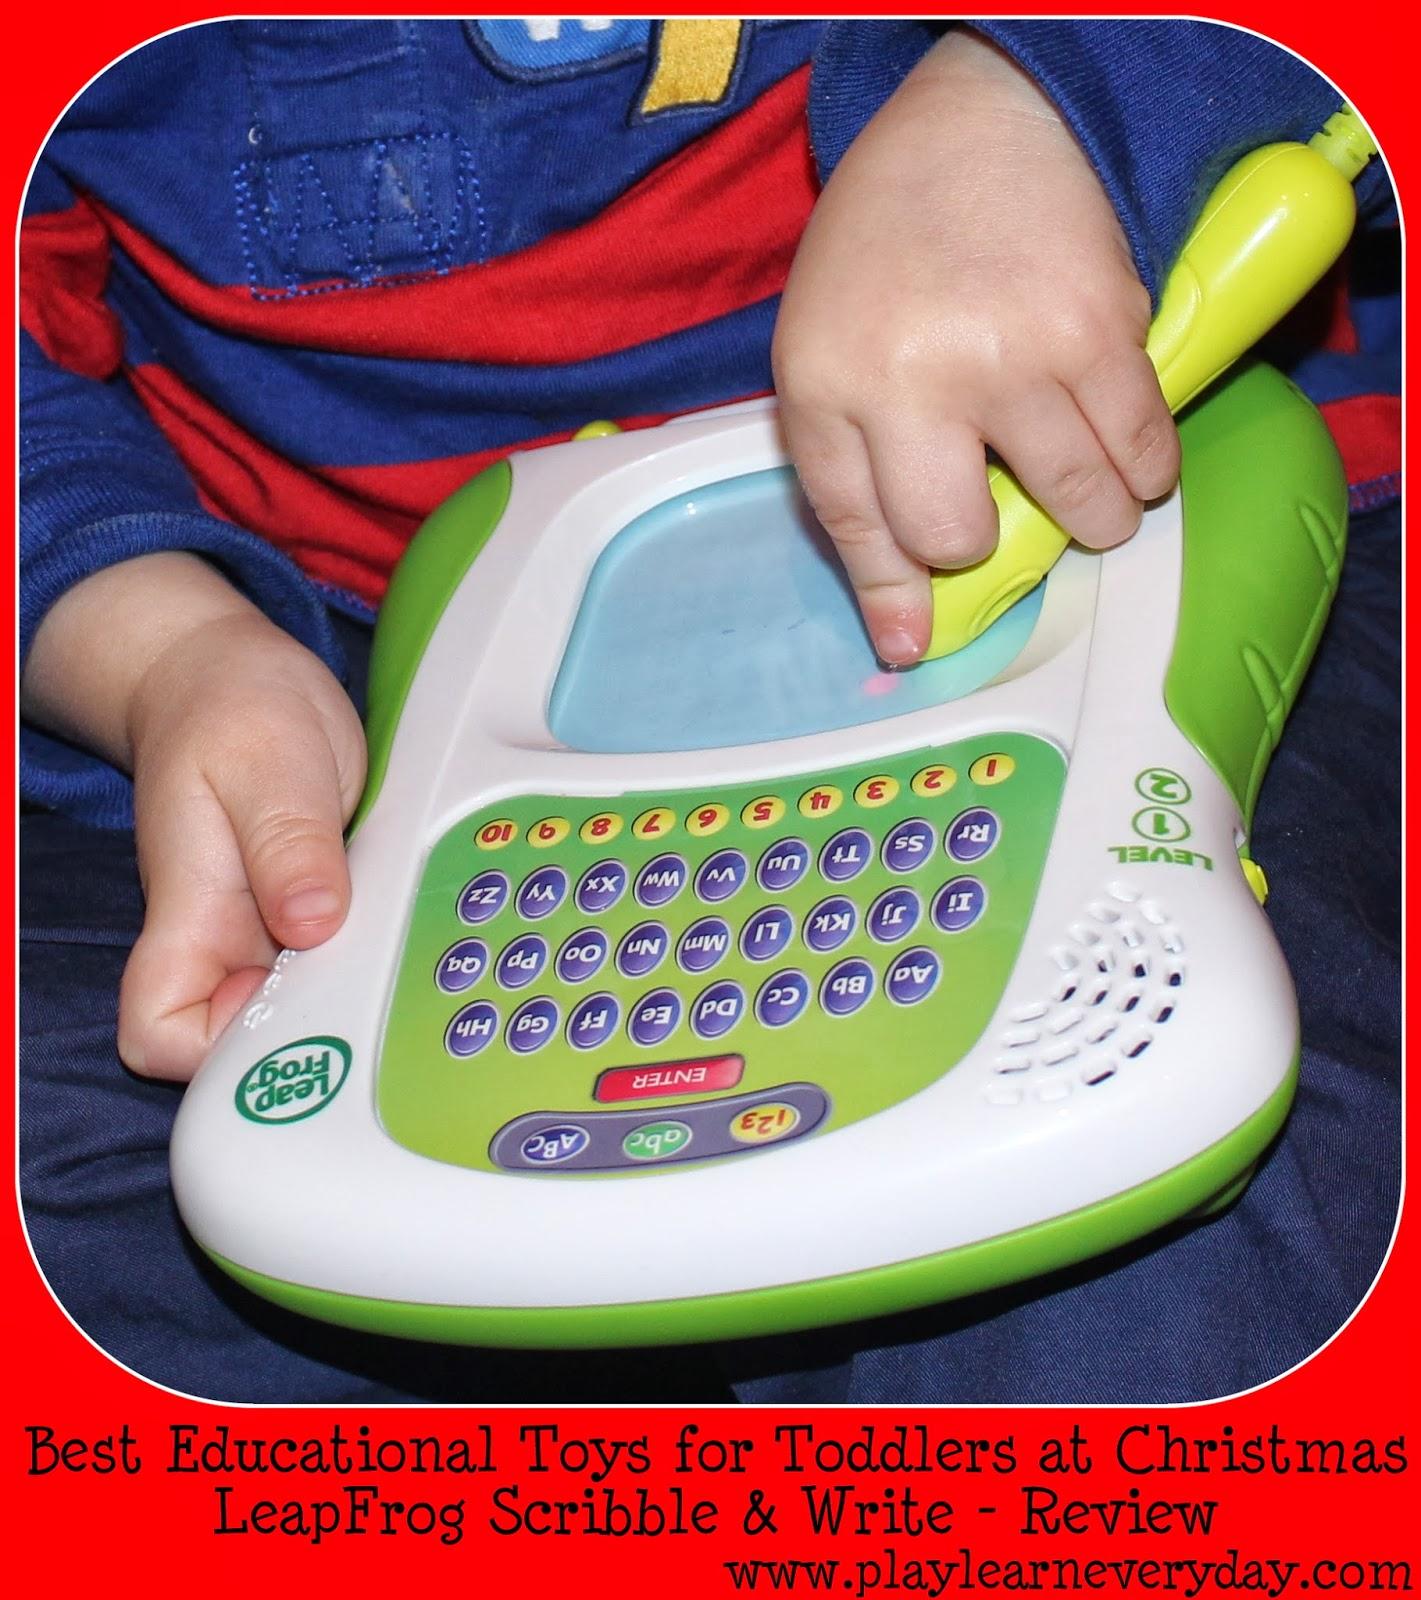 LeapFrog Scribble & Write - Educational Christmas Toy ...